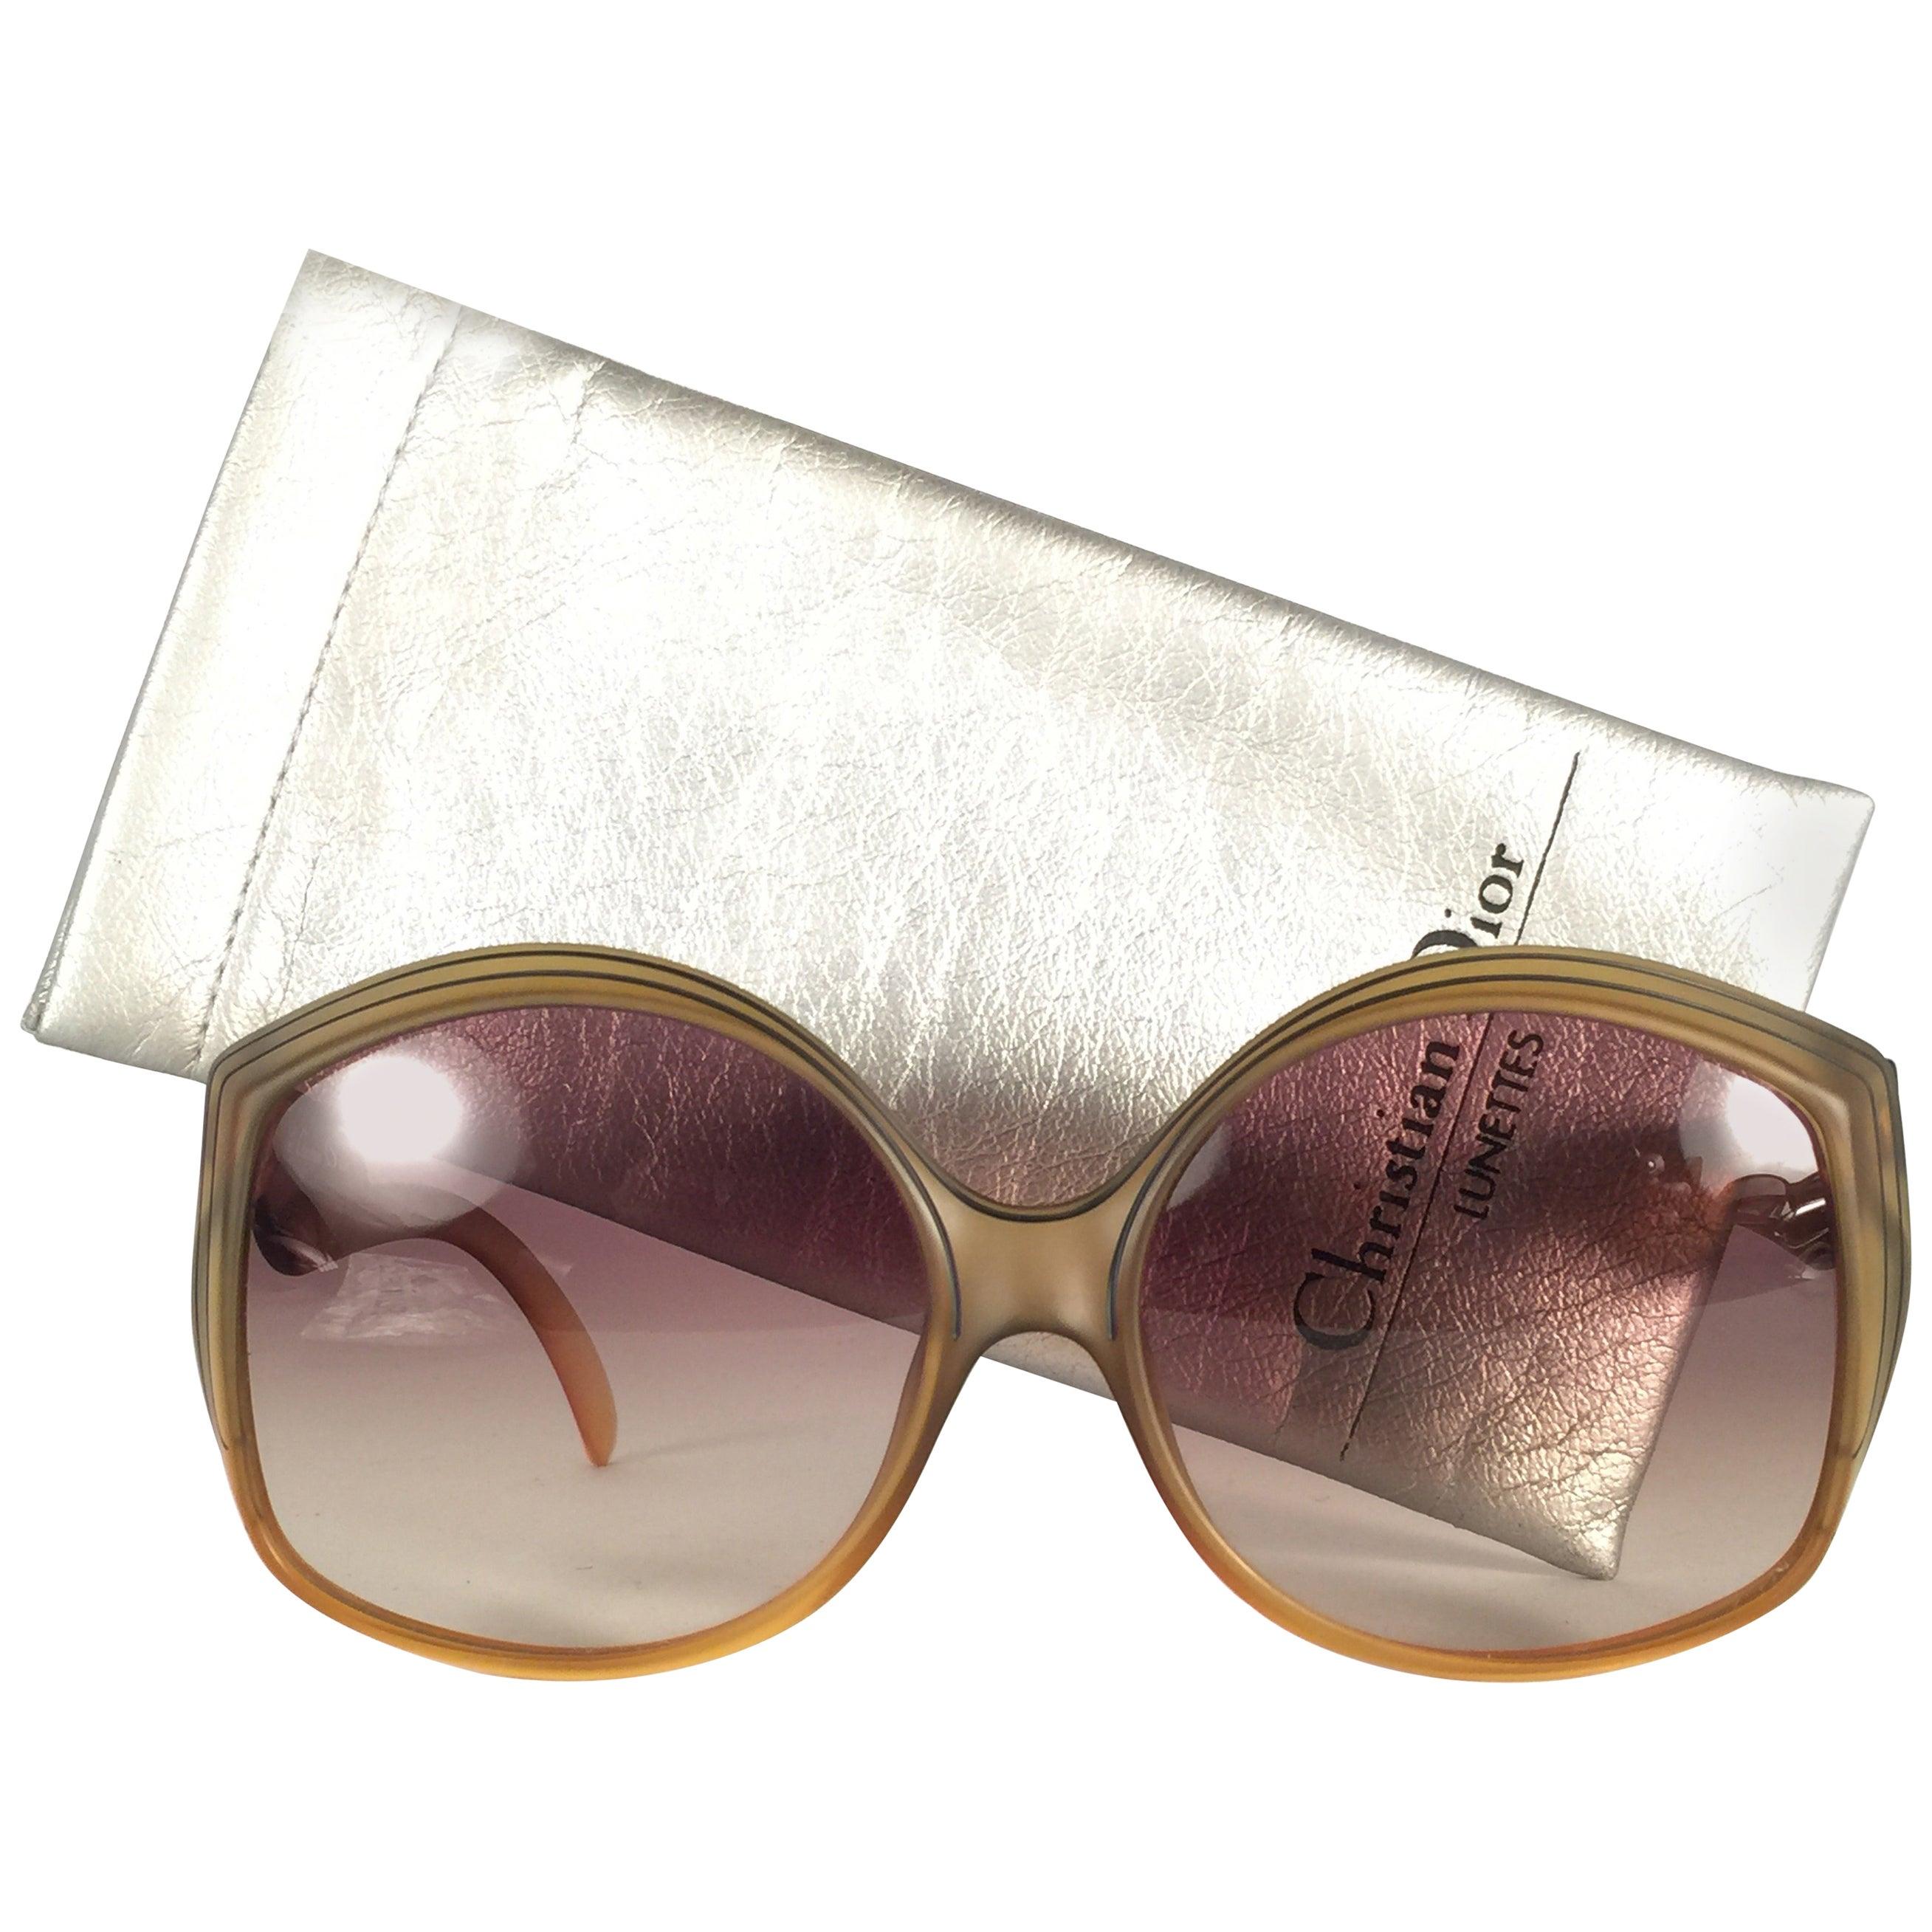 New Vintage Christian Dior 2041 10 Matte Optyl Sunglasses Austria